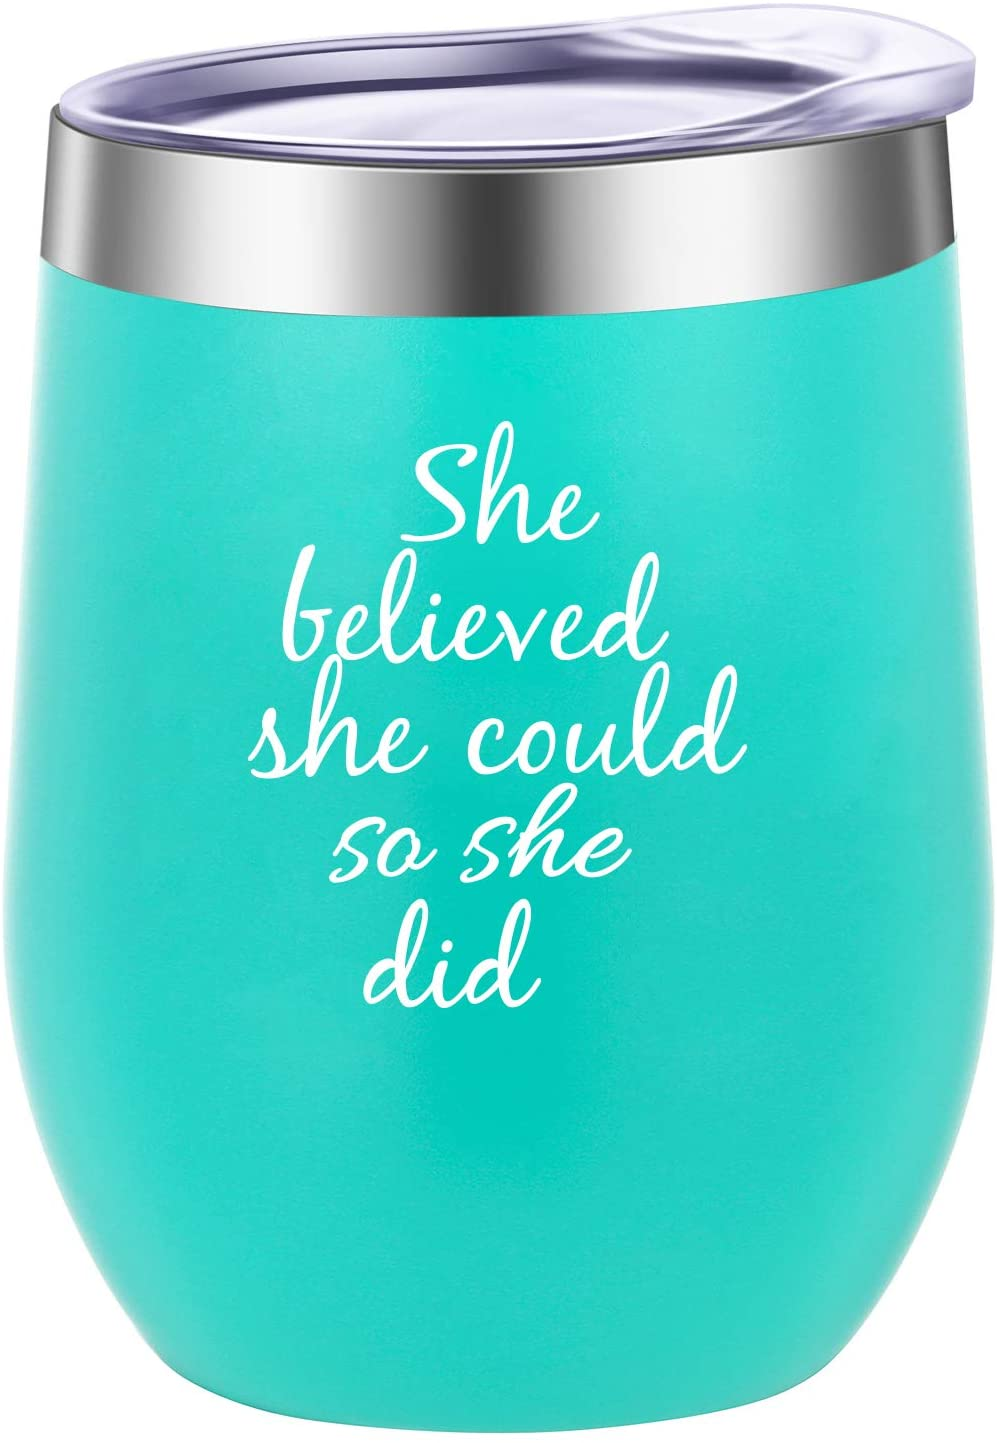 She Believed She Could So She Did Wine Tumbler Mug,Spiritual Inspiritional Gifts for Women,Congratulations, Graduation,Going Away,Job Change,Congrats,Birthday Gift doctorate graduation Gifts 12 oz